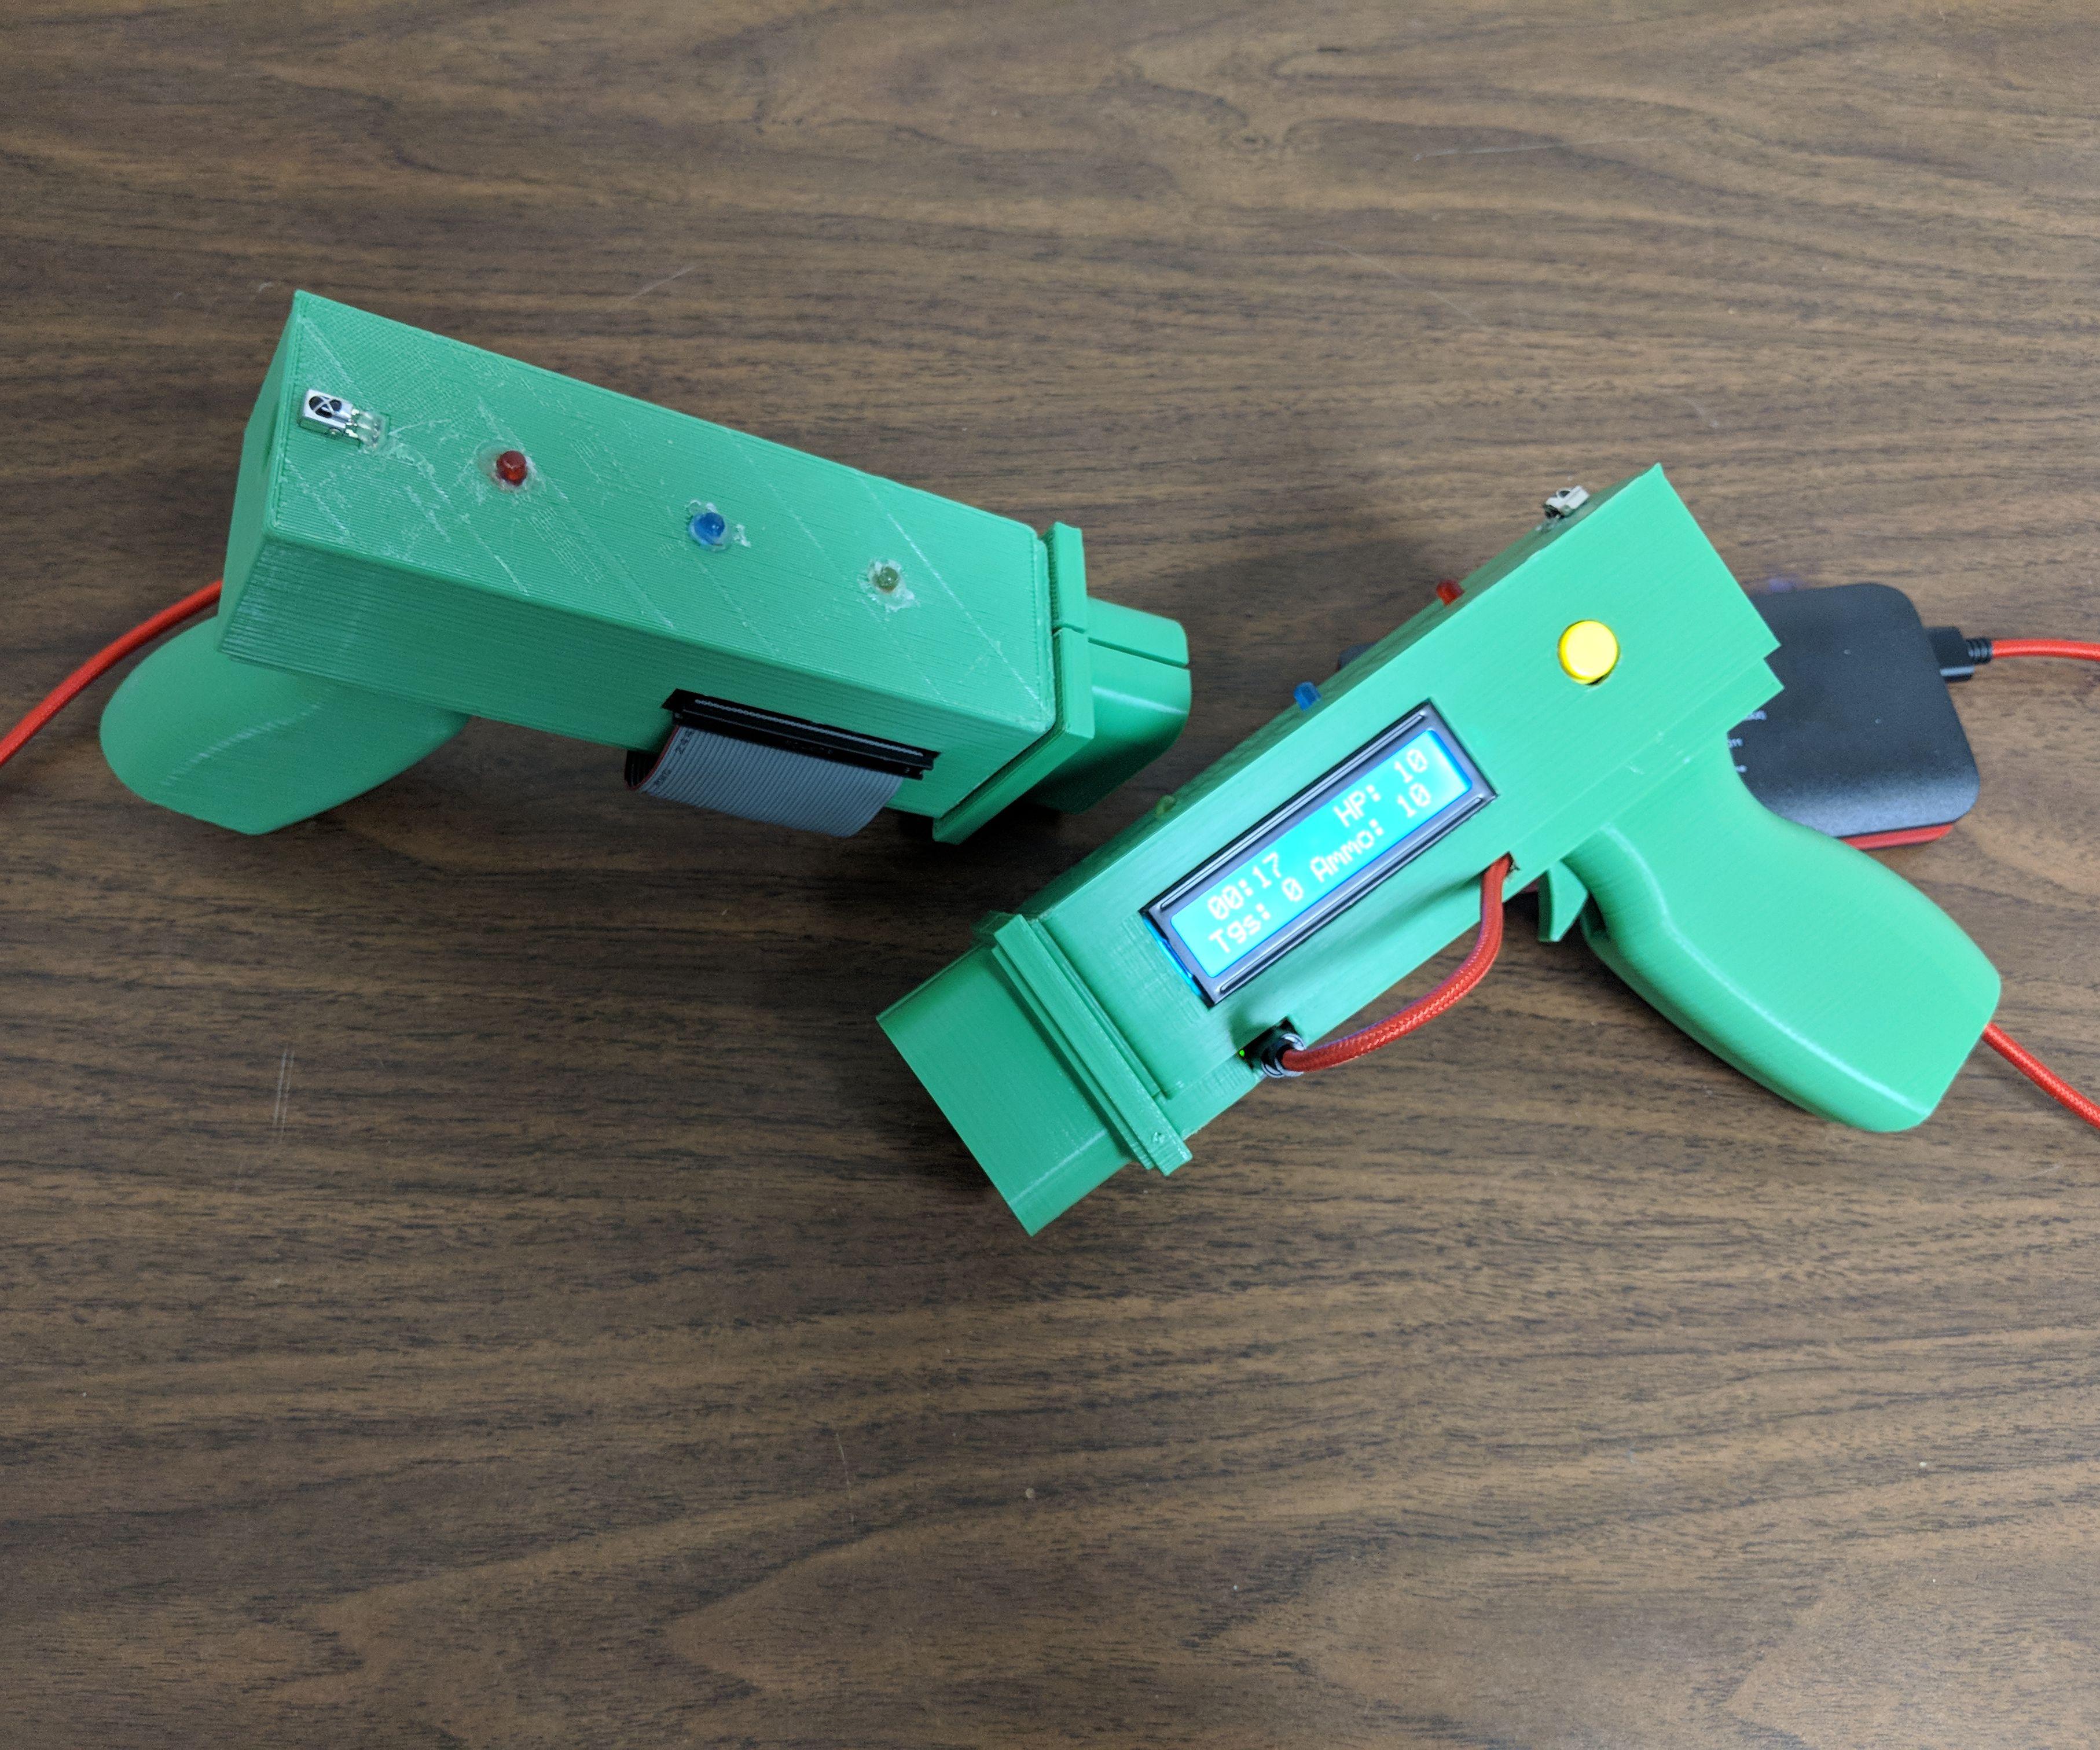 Infrared Laser Tag With Raspberry Pi Zero